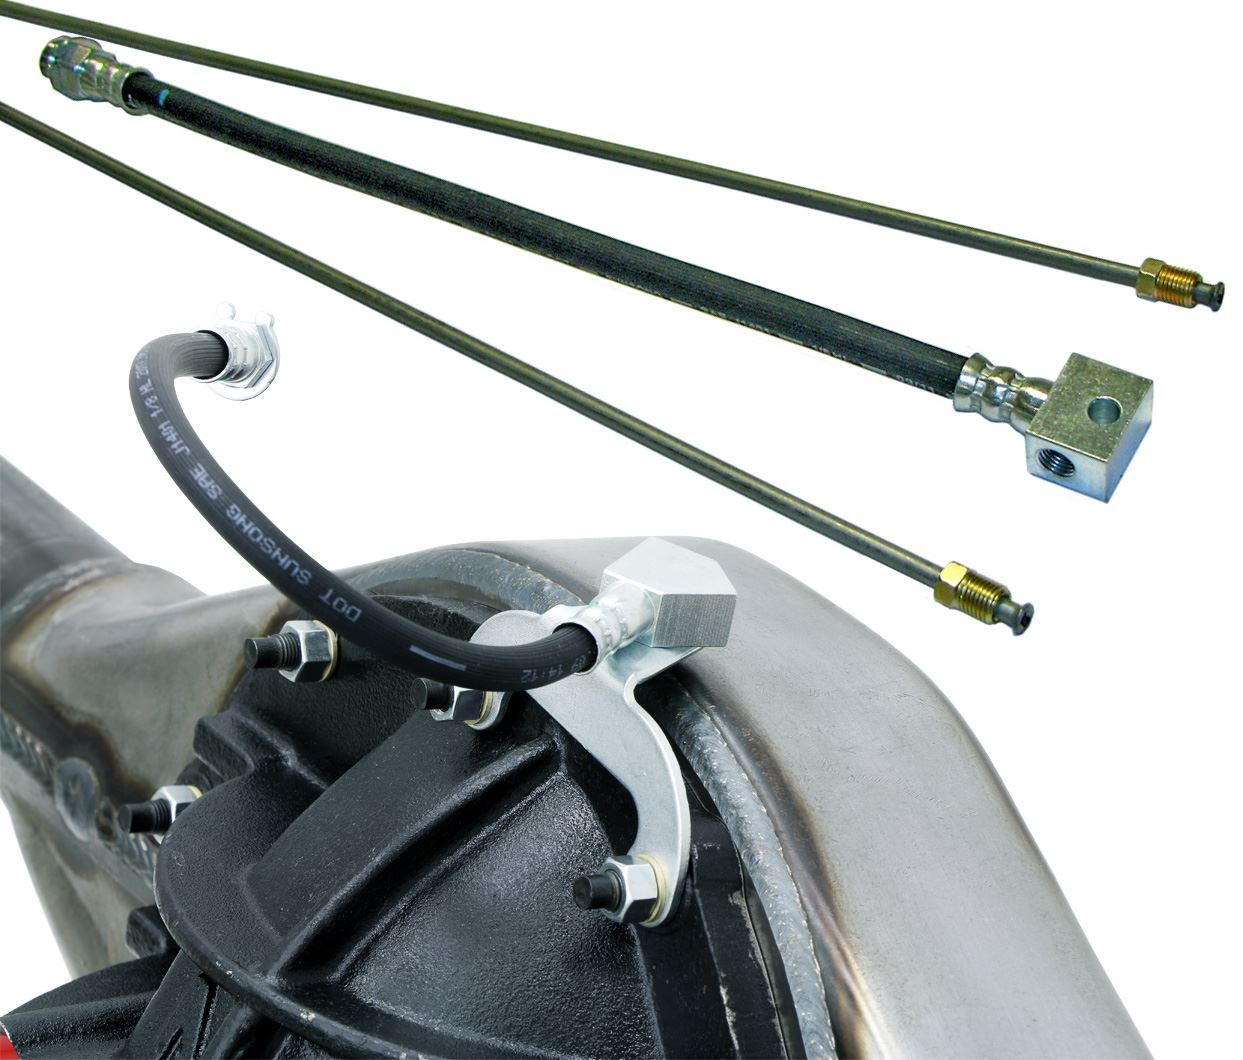 Carbolook Hose /& Stainless Green Banjos Pro Braking PBK9429-CAR-GRE Front//Rear Braided Brake Line